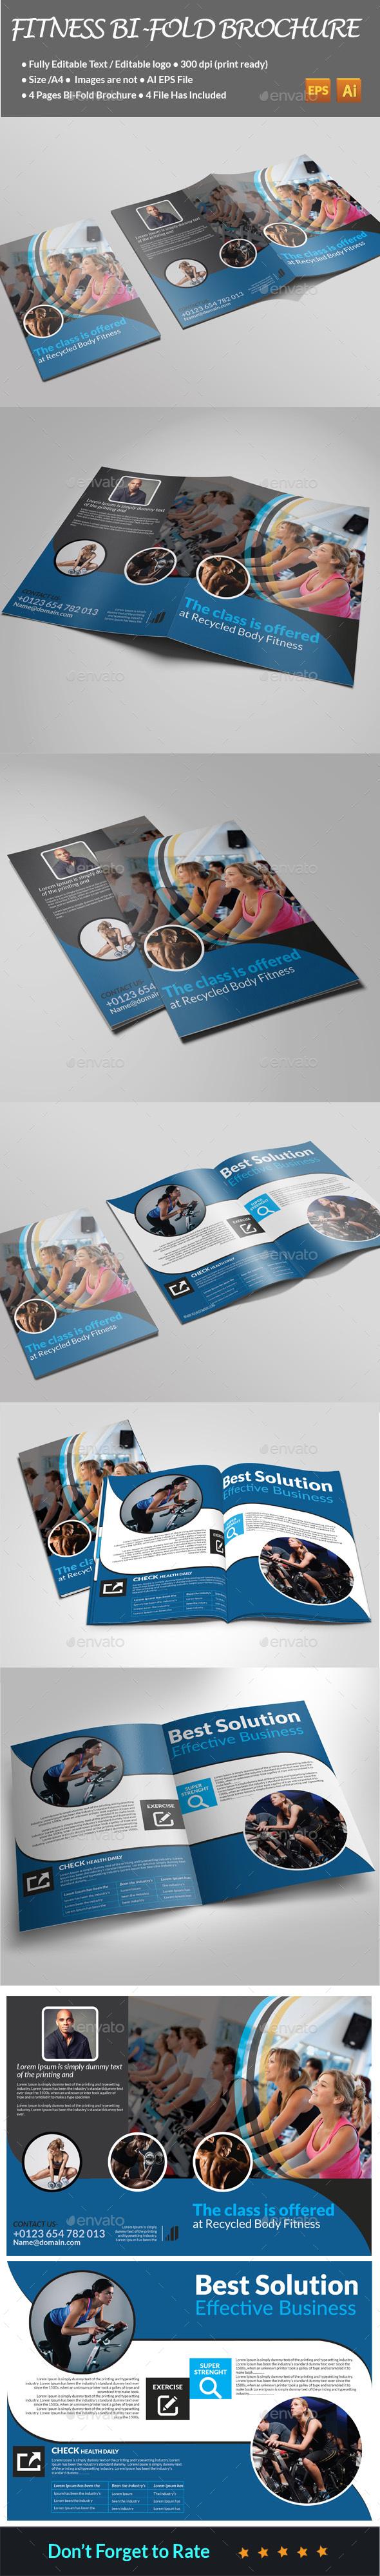 Fitness Bi-Fold Brochure